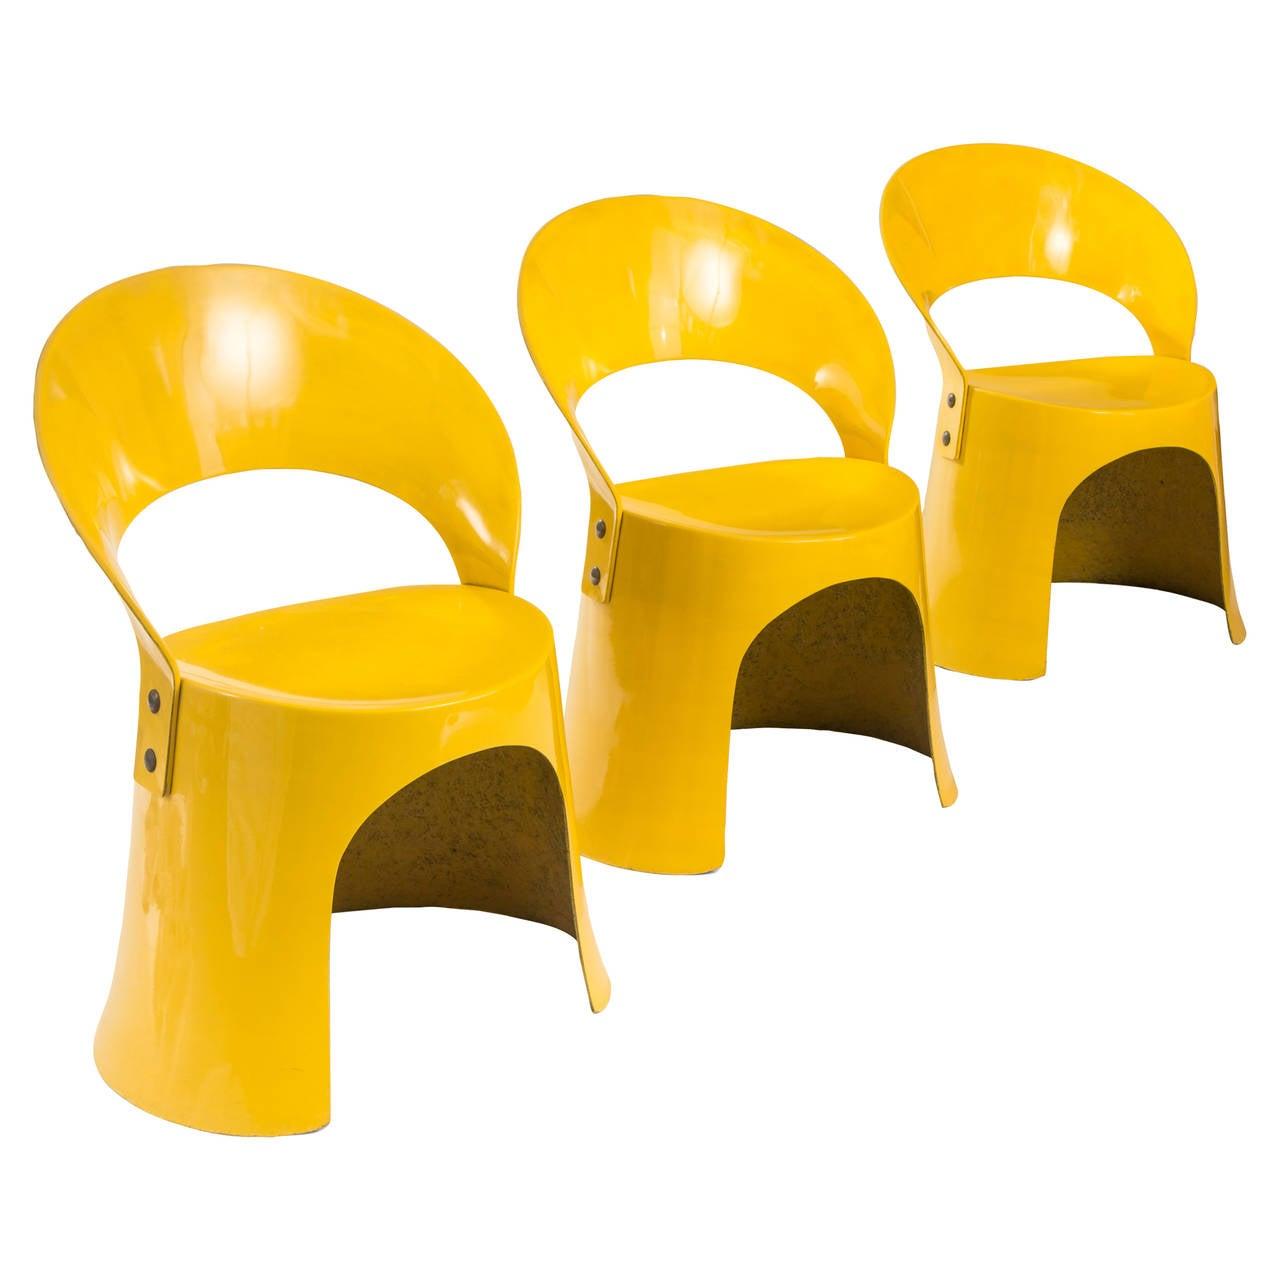 Nanna Ditzel for Oddense Maskinsnedkeri, A Rare Set of 3 Fiberglass Chairs For Sale